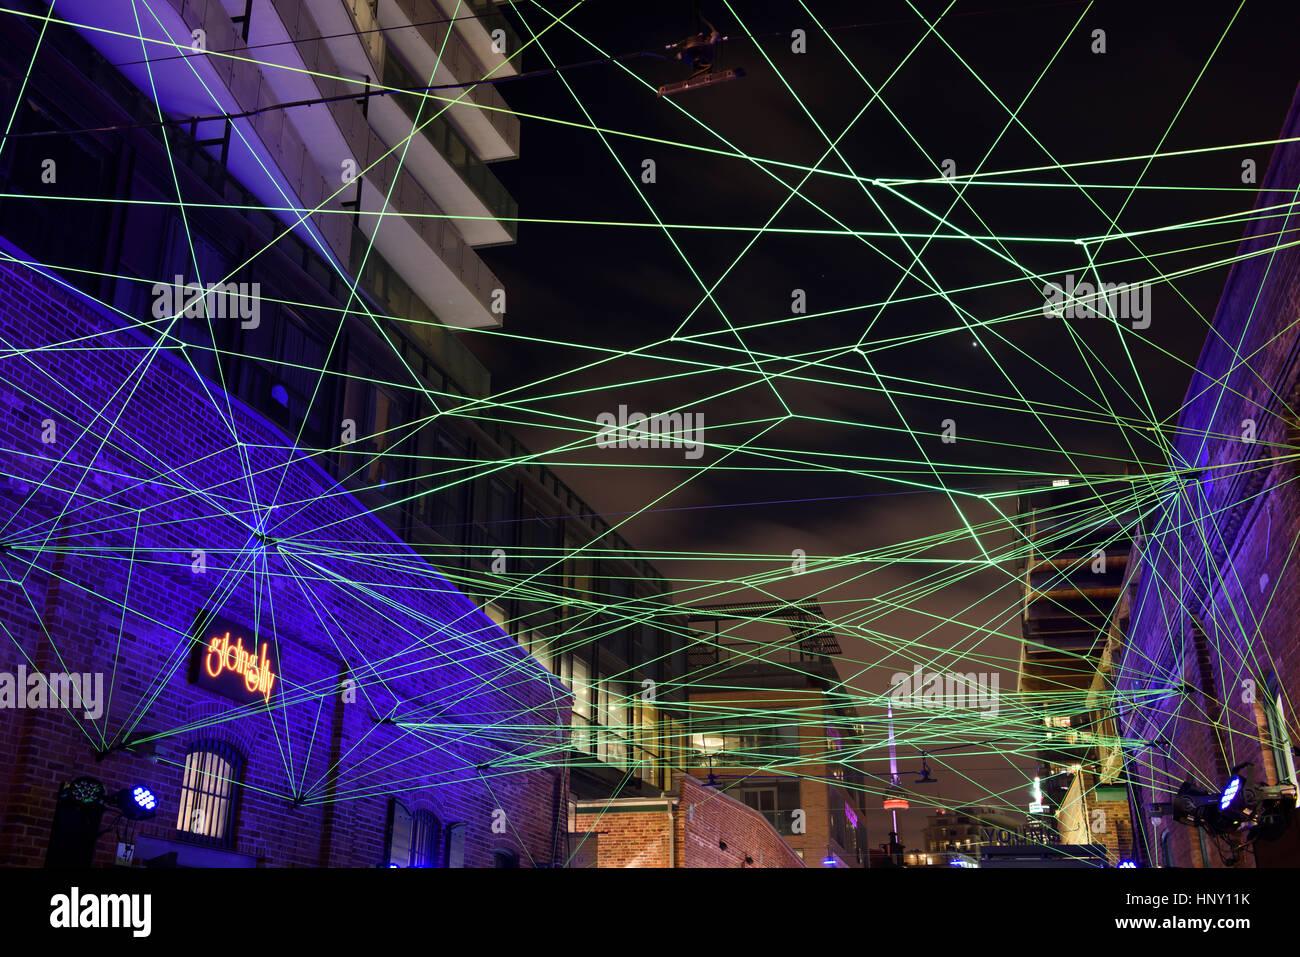 https www alamy com stock photo green fiber optic cables art installation at toronto light festival 133973887 html